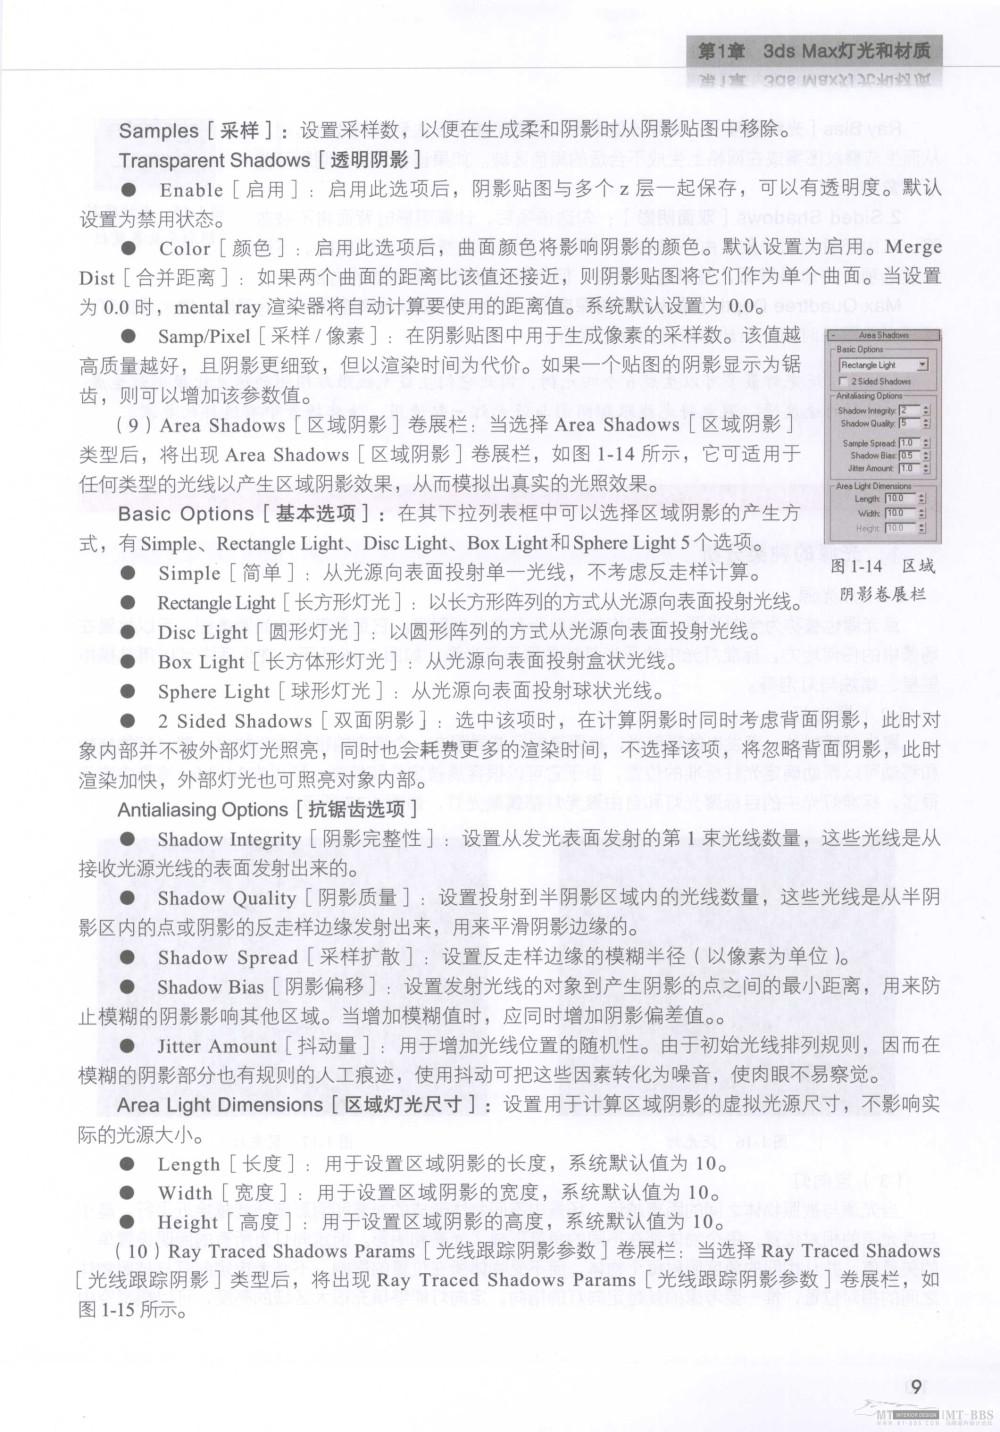 水晶石技法-3ds_Max&VRay室内空间表现_水晶石技法-3ds_Max&VRay室内空间表现_页面_015.jpg